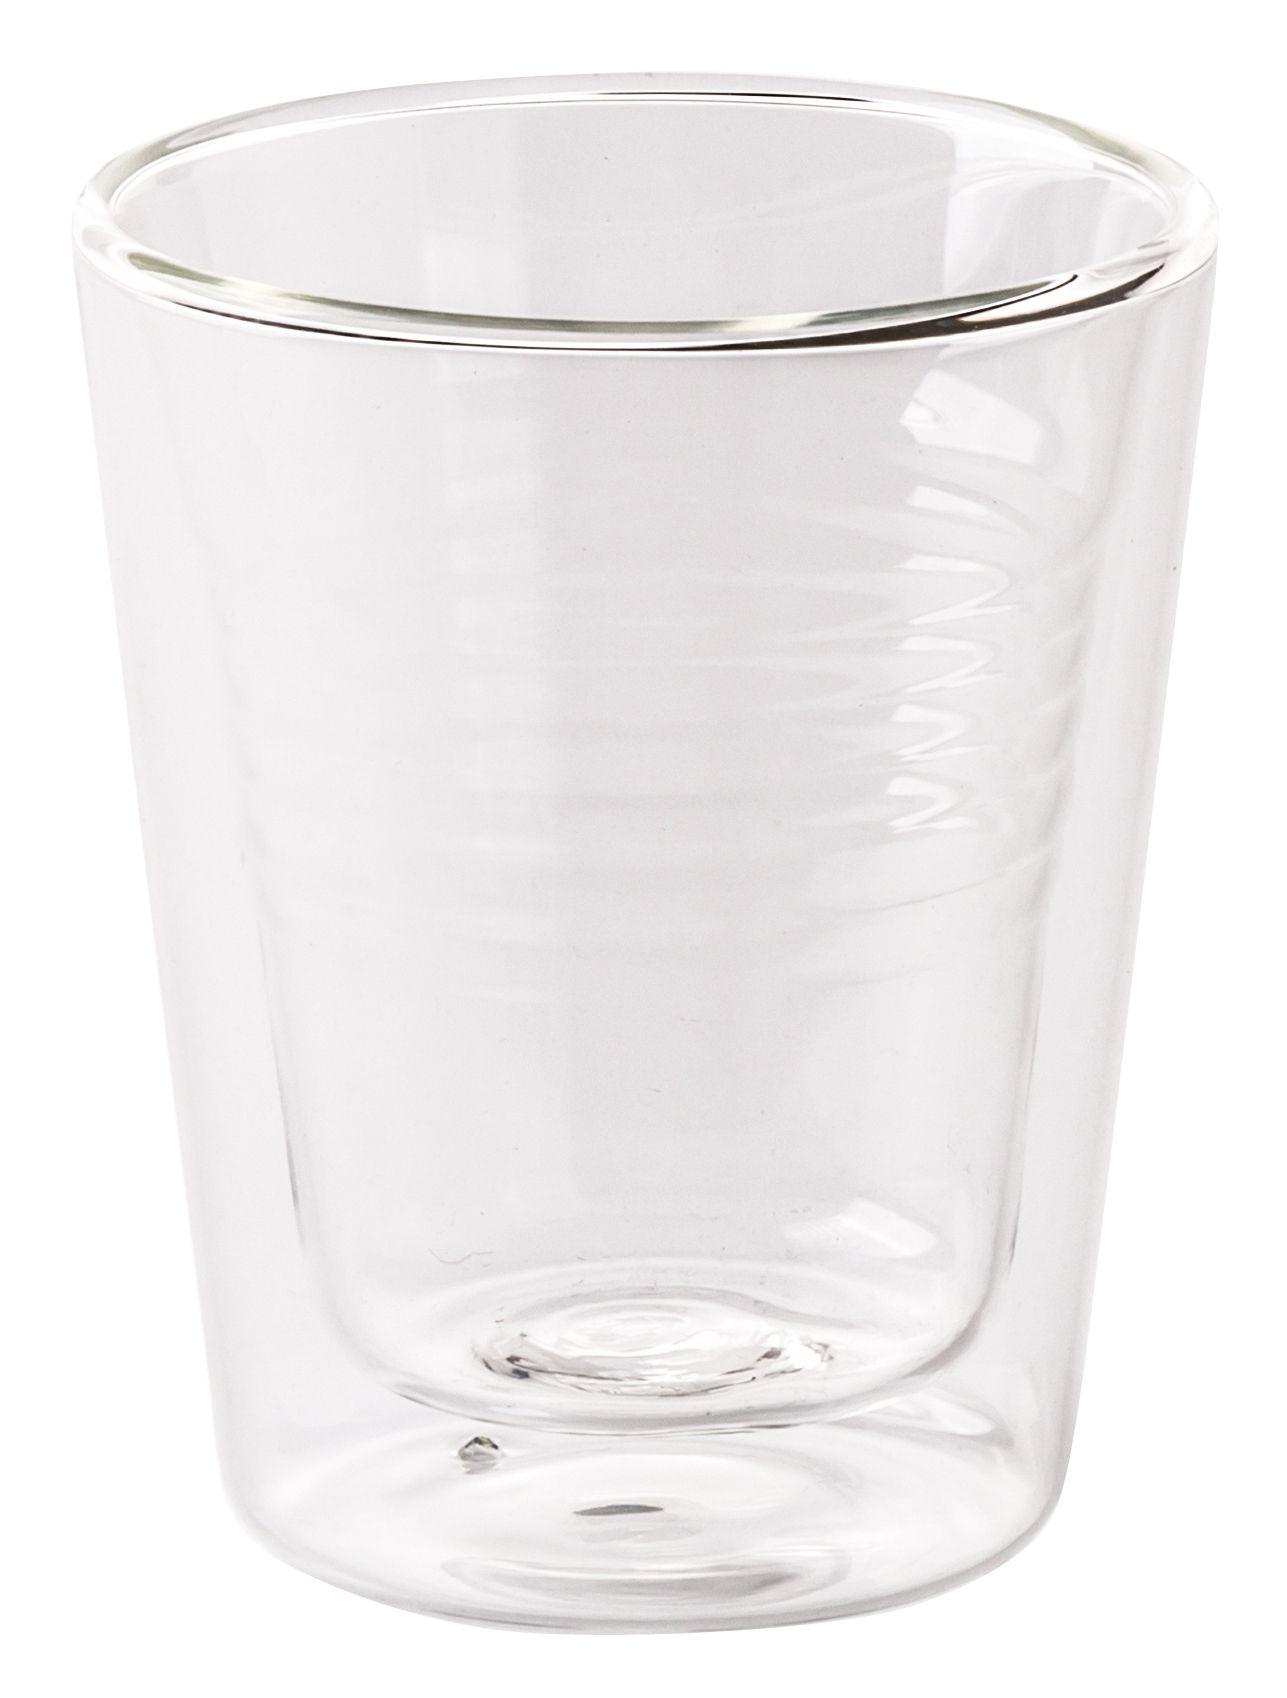 Arts de la table - Tasses et mugs - Mug isotherme Estetico Quotidiano / Verre - Seletti - Transparent - Verre de borosilicate